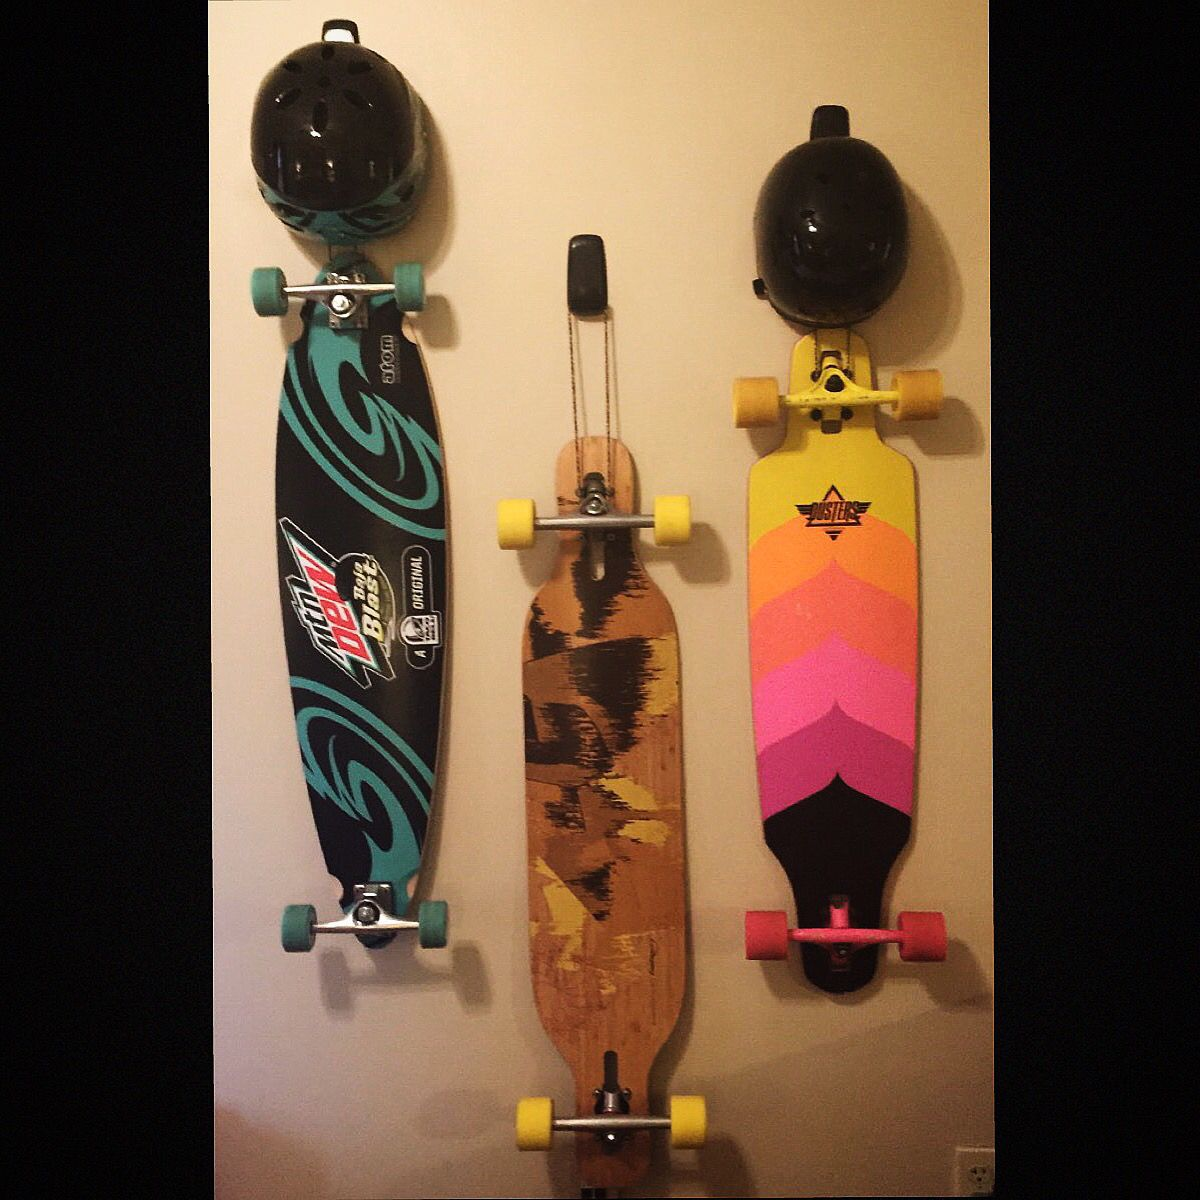 Black Skateboard Deck Display Wall Mount Hanger Rack Holder Hanging Brackets New